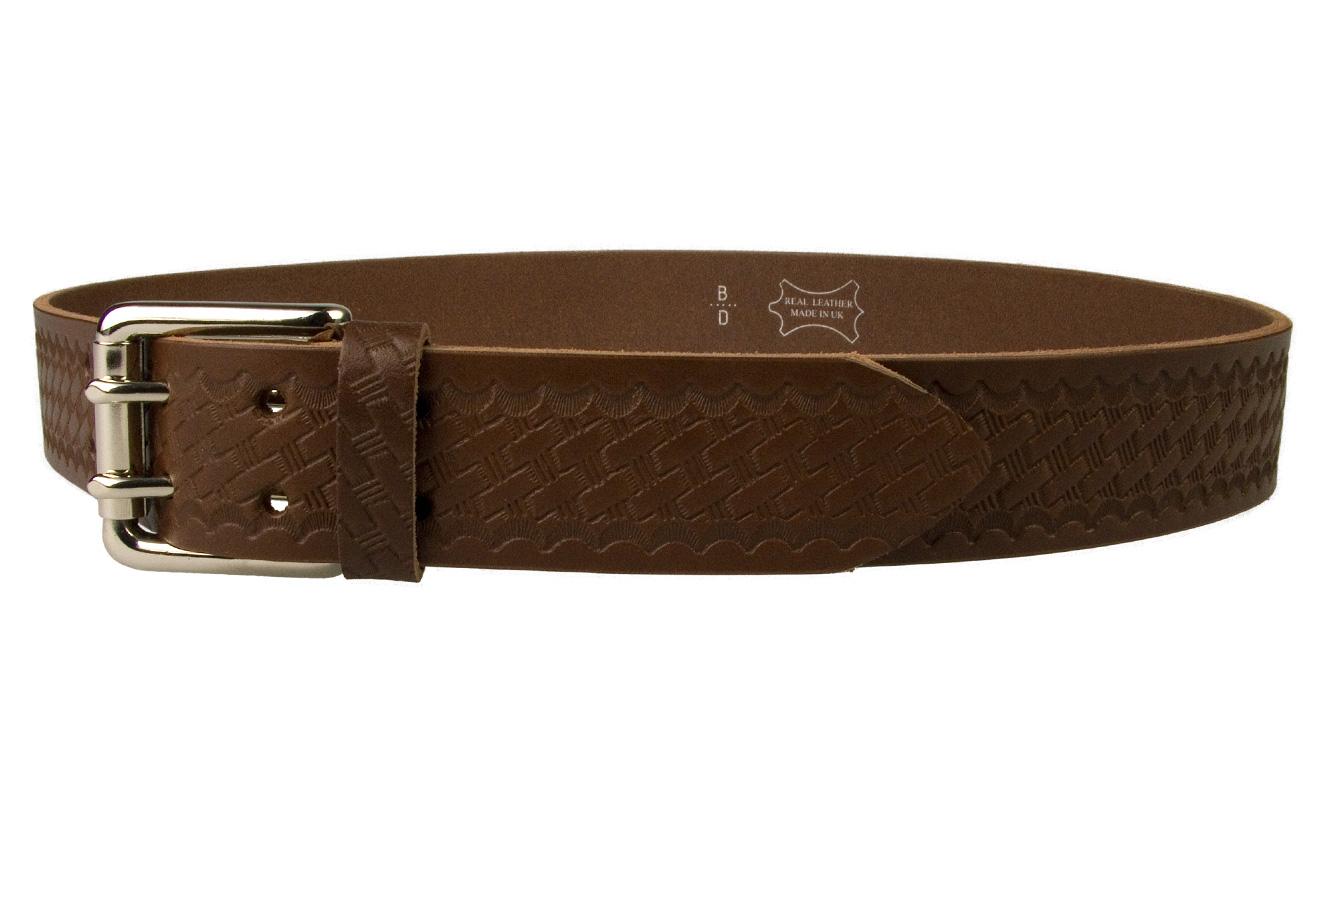 Brown Basket Weave Embossed Leather Duty Belt MADE IN UK ...